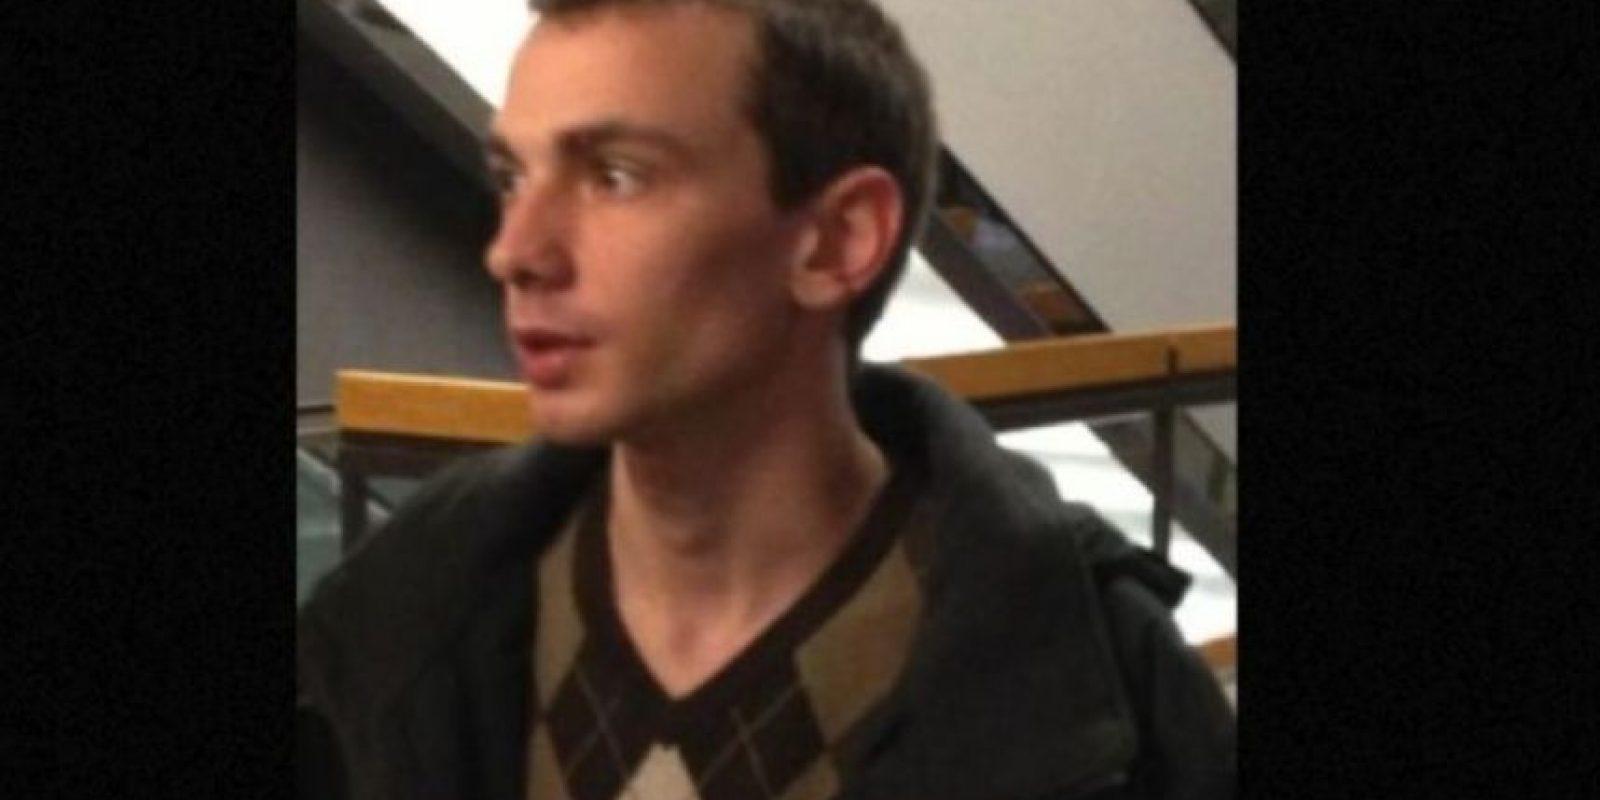 Ahora, el Tribunal Superior de Justicia de Quebec trabaja en la sentencia de este hombre. Foto:Twitter